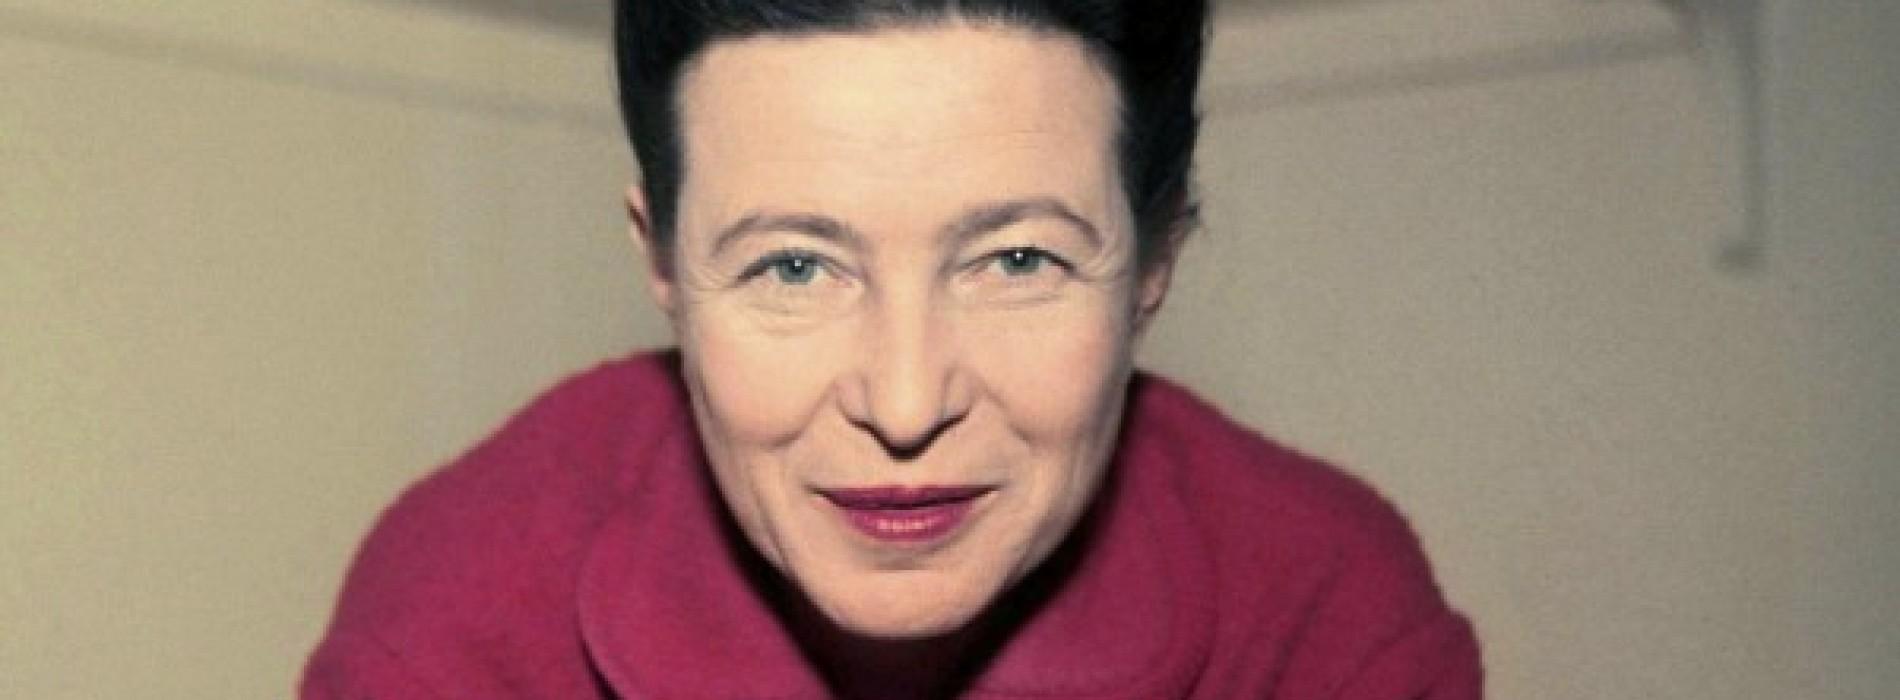 A atualidade de Simone Beauvoir e a denúncia ao pensamento de direita